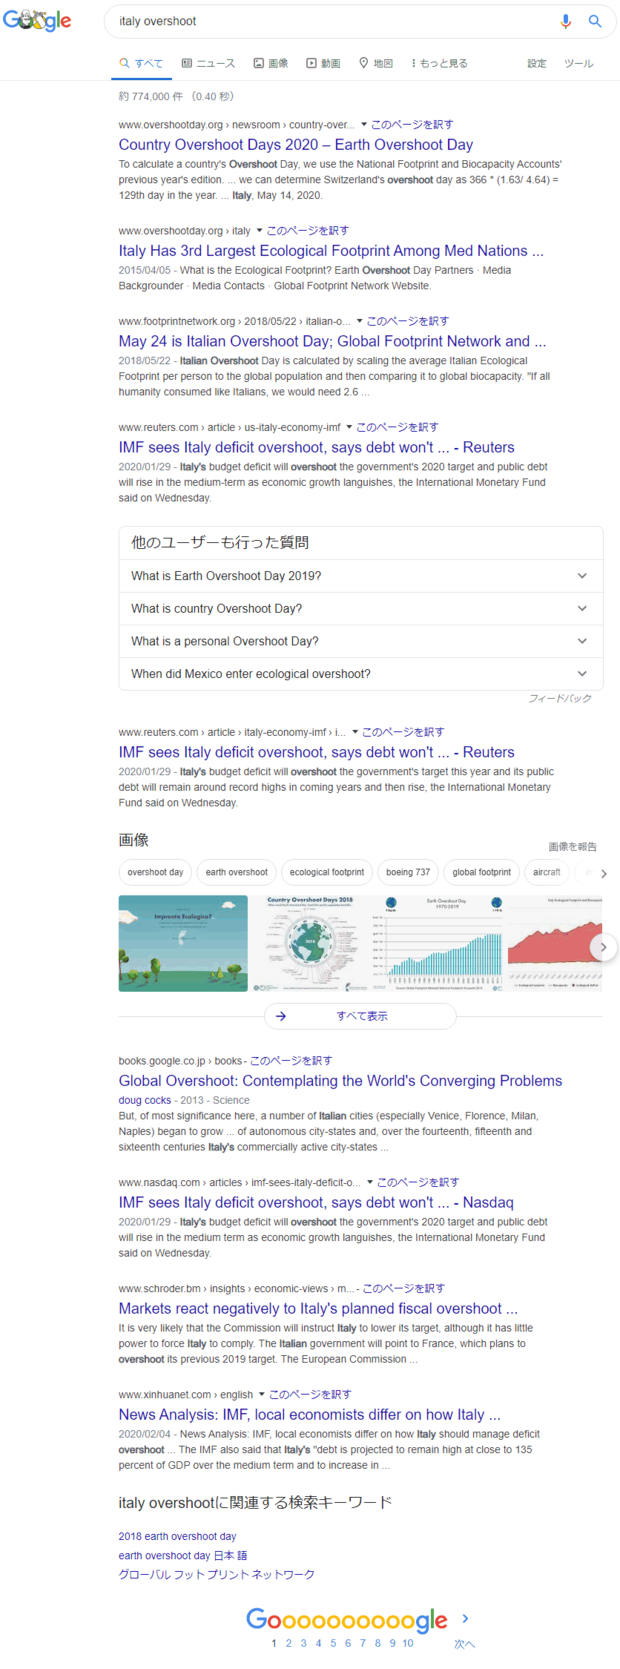 screenshot-www.google.com-2020.03.20-07_22_14.png